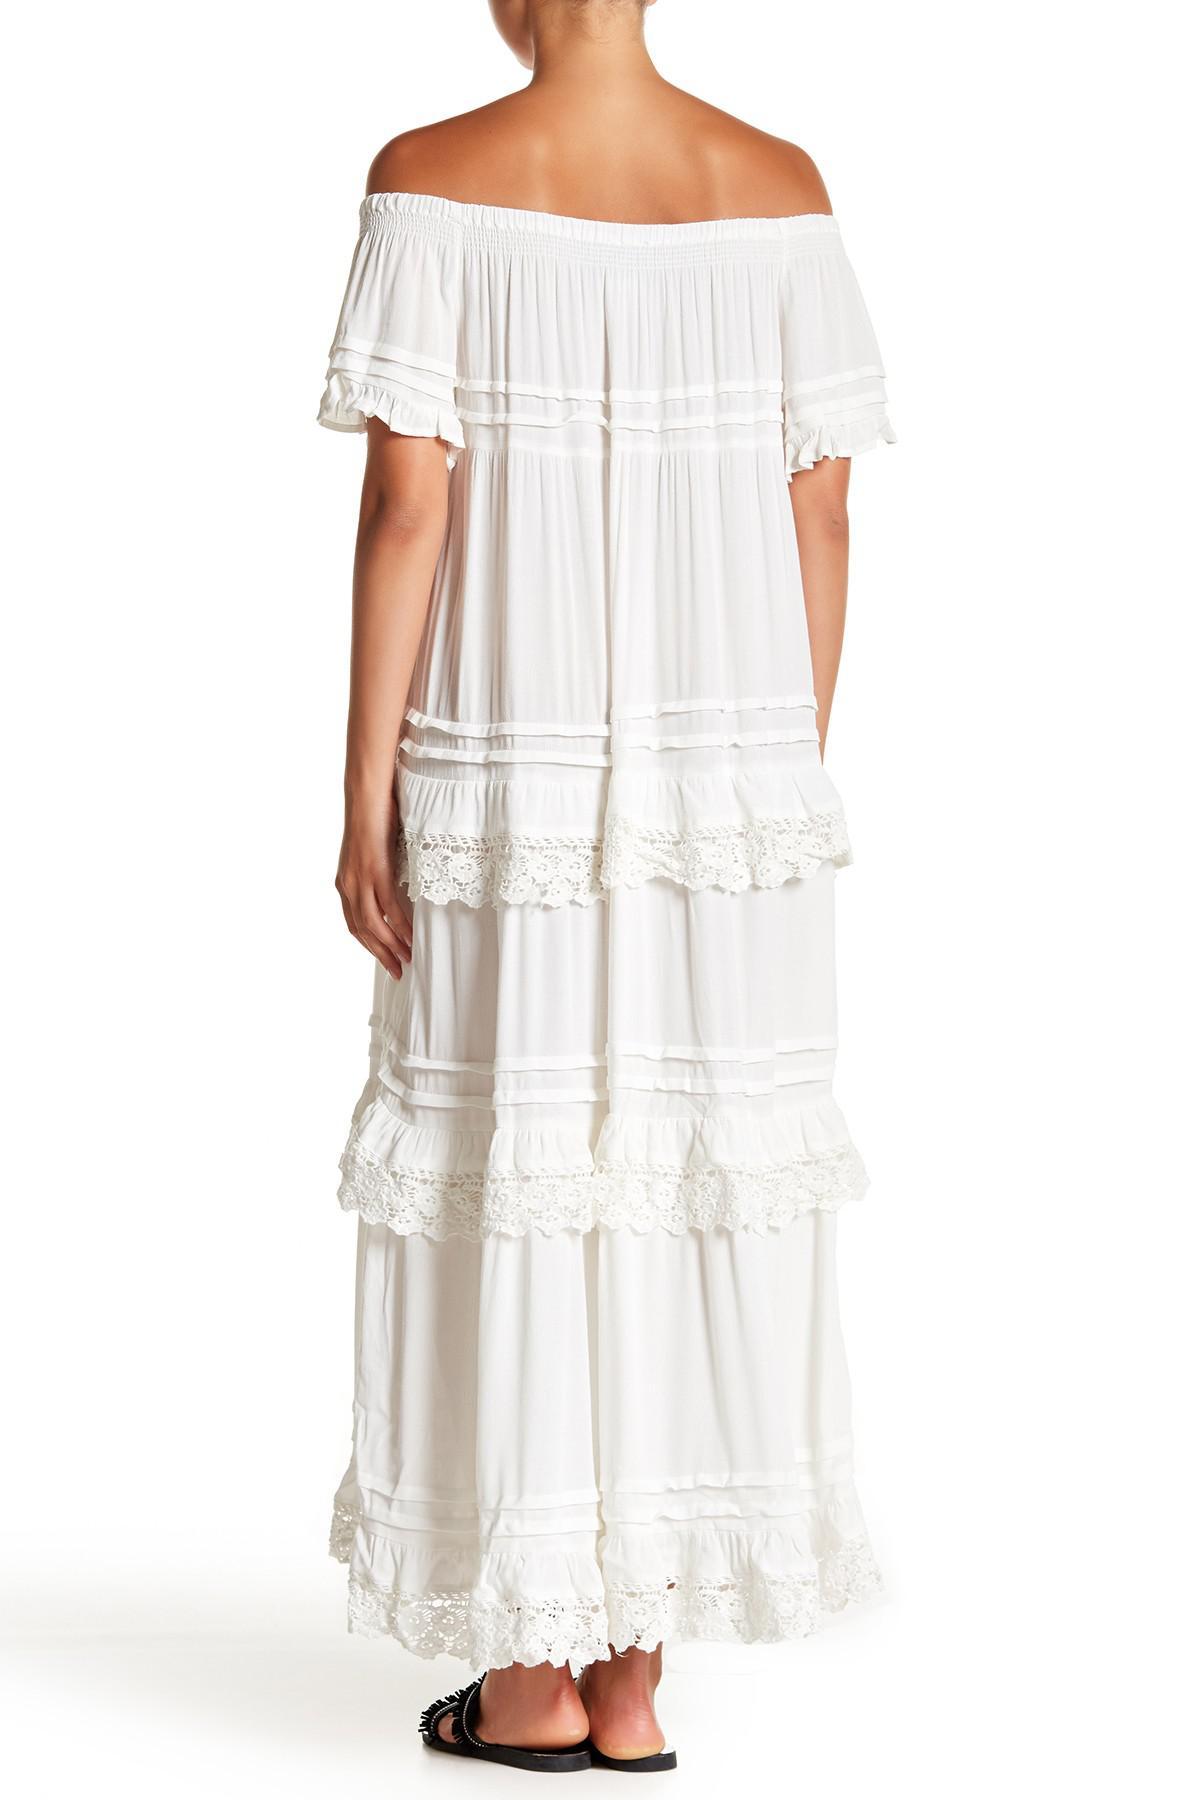 812cf14465a Lyst - Muche Et Muchette Lace Trim Off-the-shoulder Maxi Dress in White